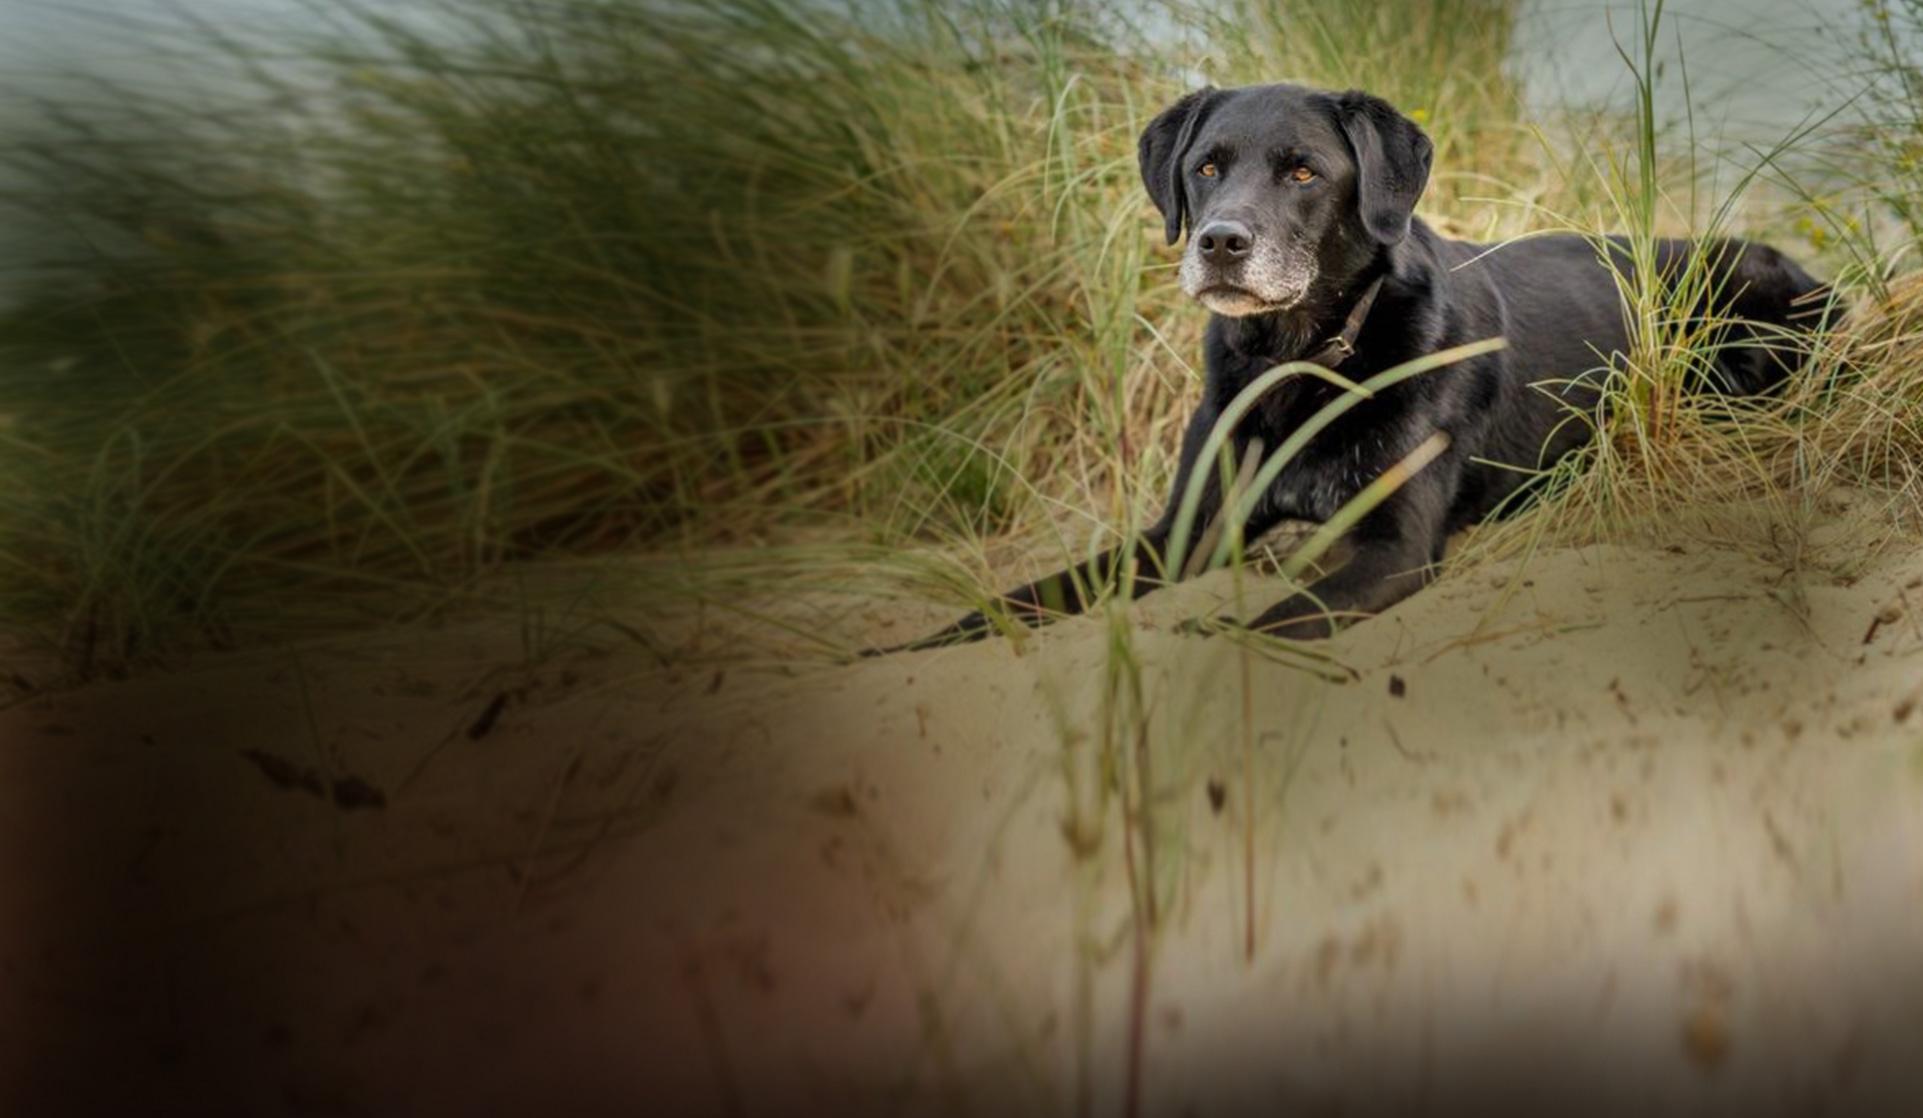 Dog in dune